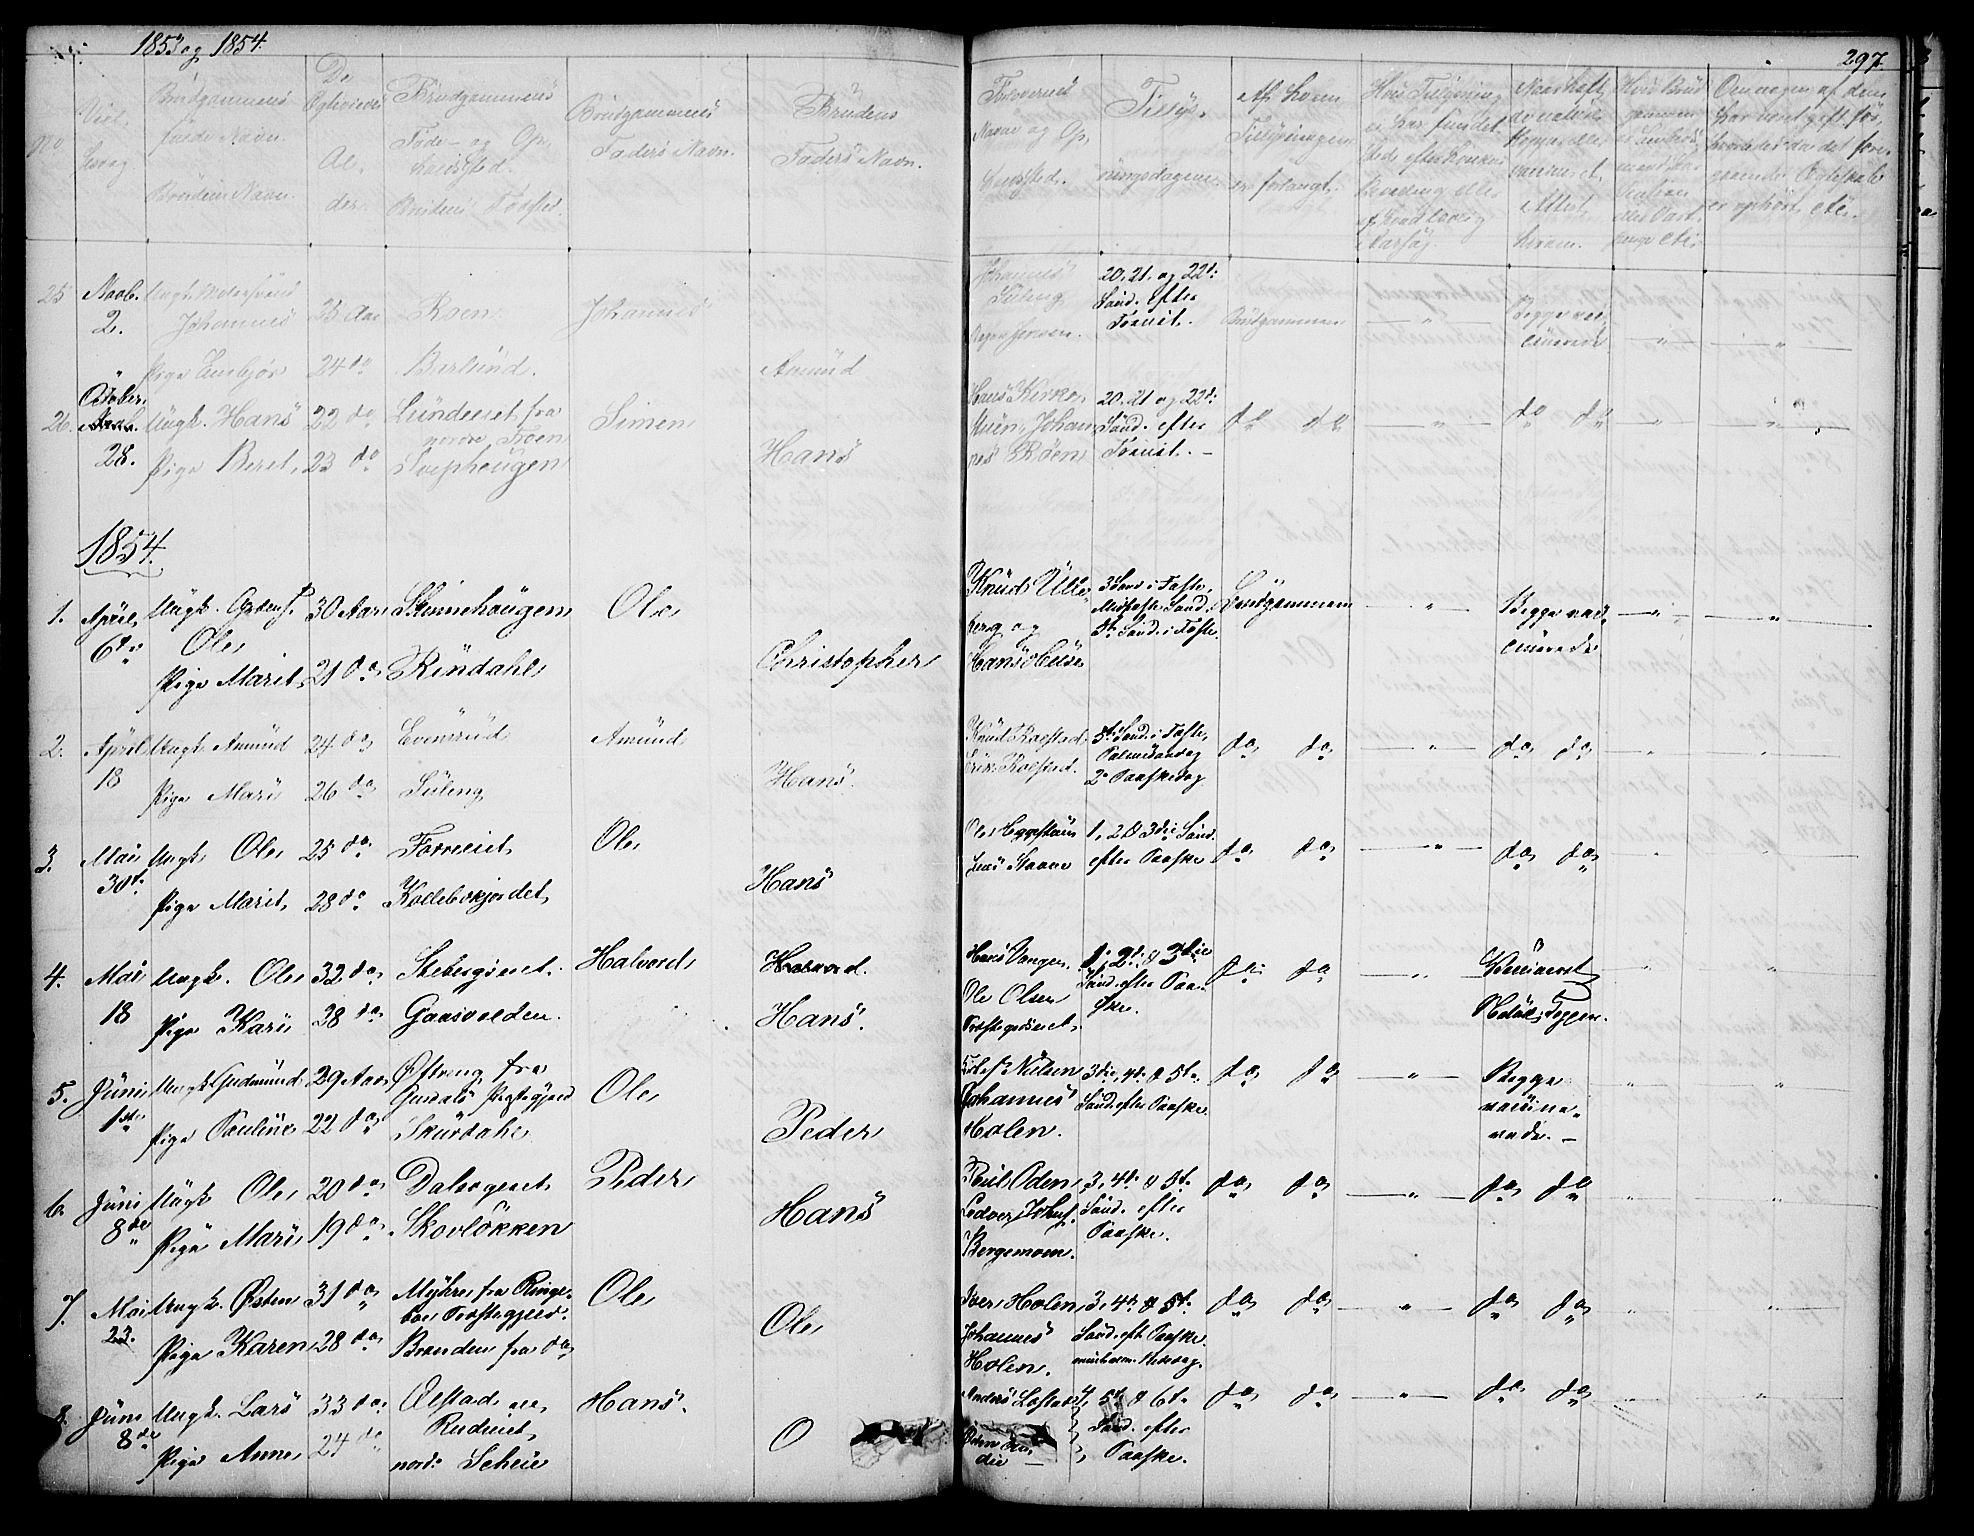 SAH, Sør-Fron prestekontor, H/Ha/Hab/L0001: Klokkerbok nr. 1, 1844-1863, s. 297